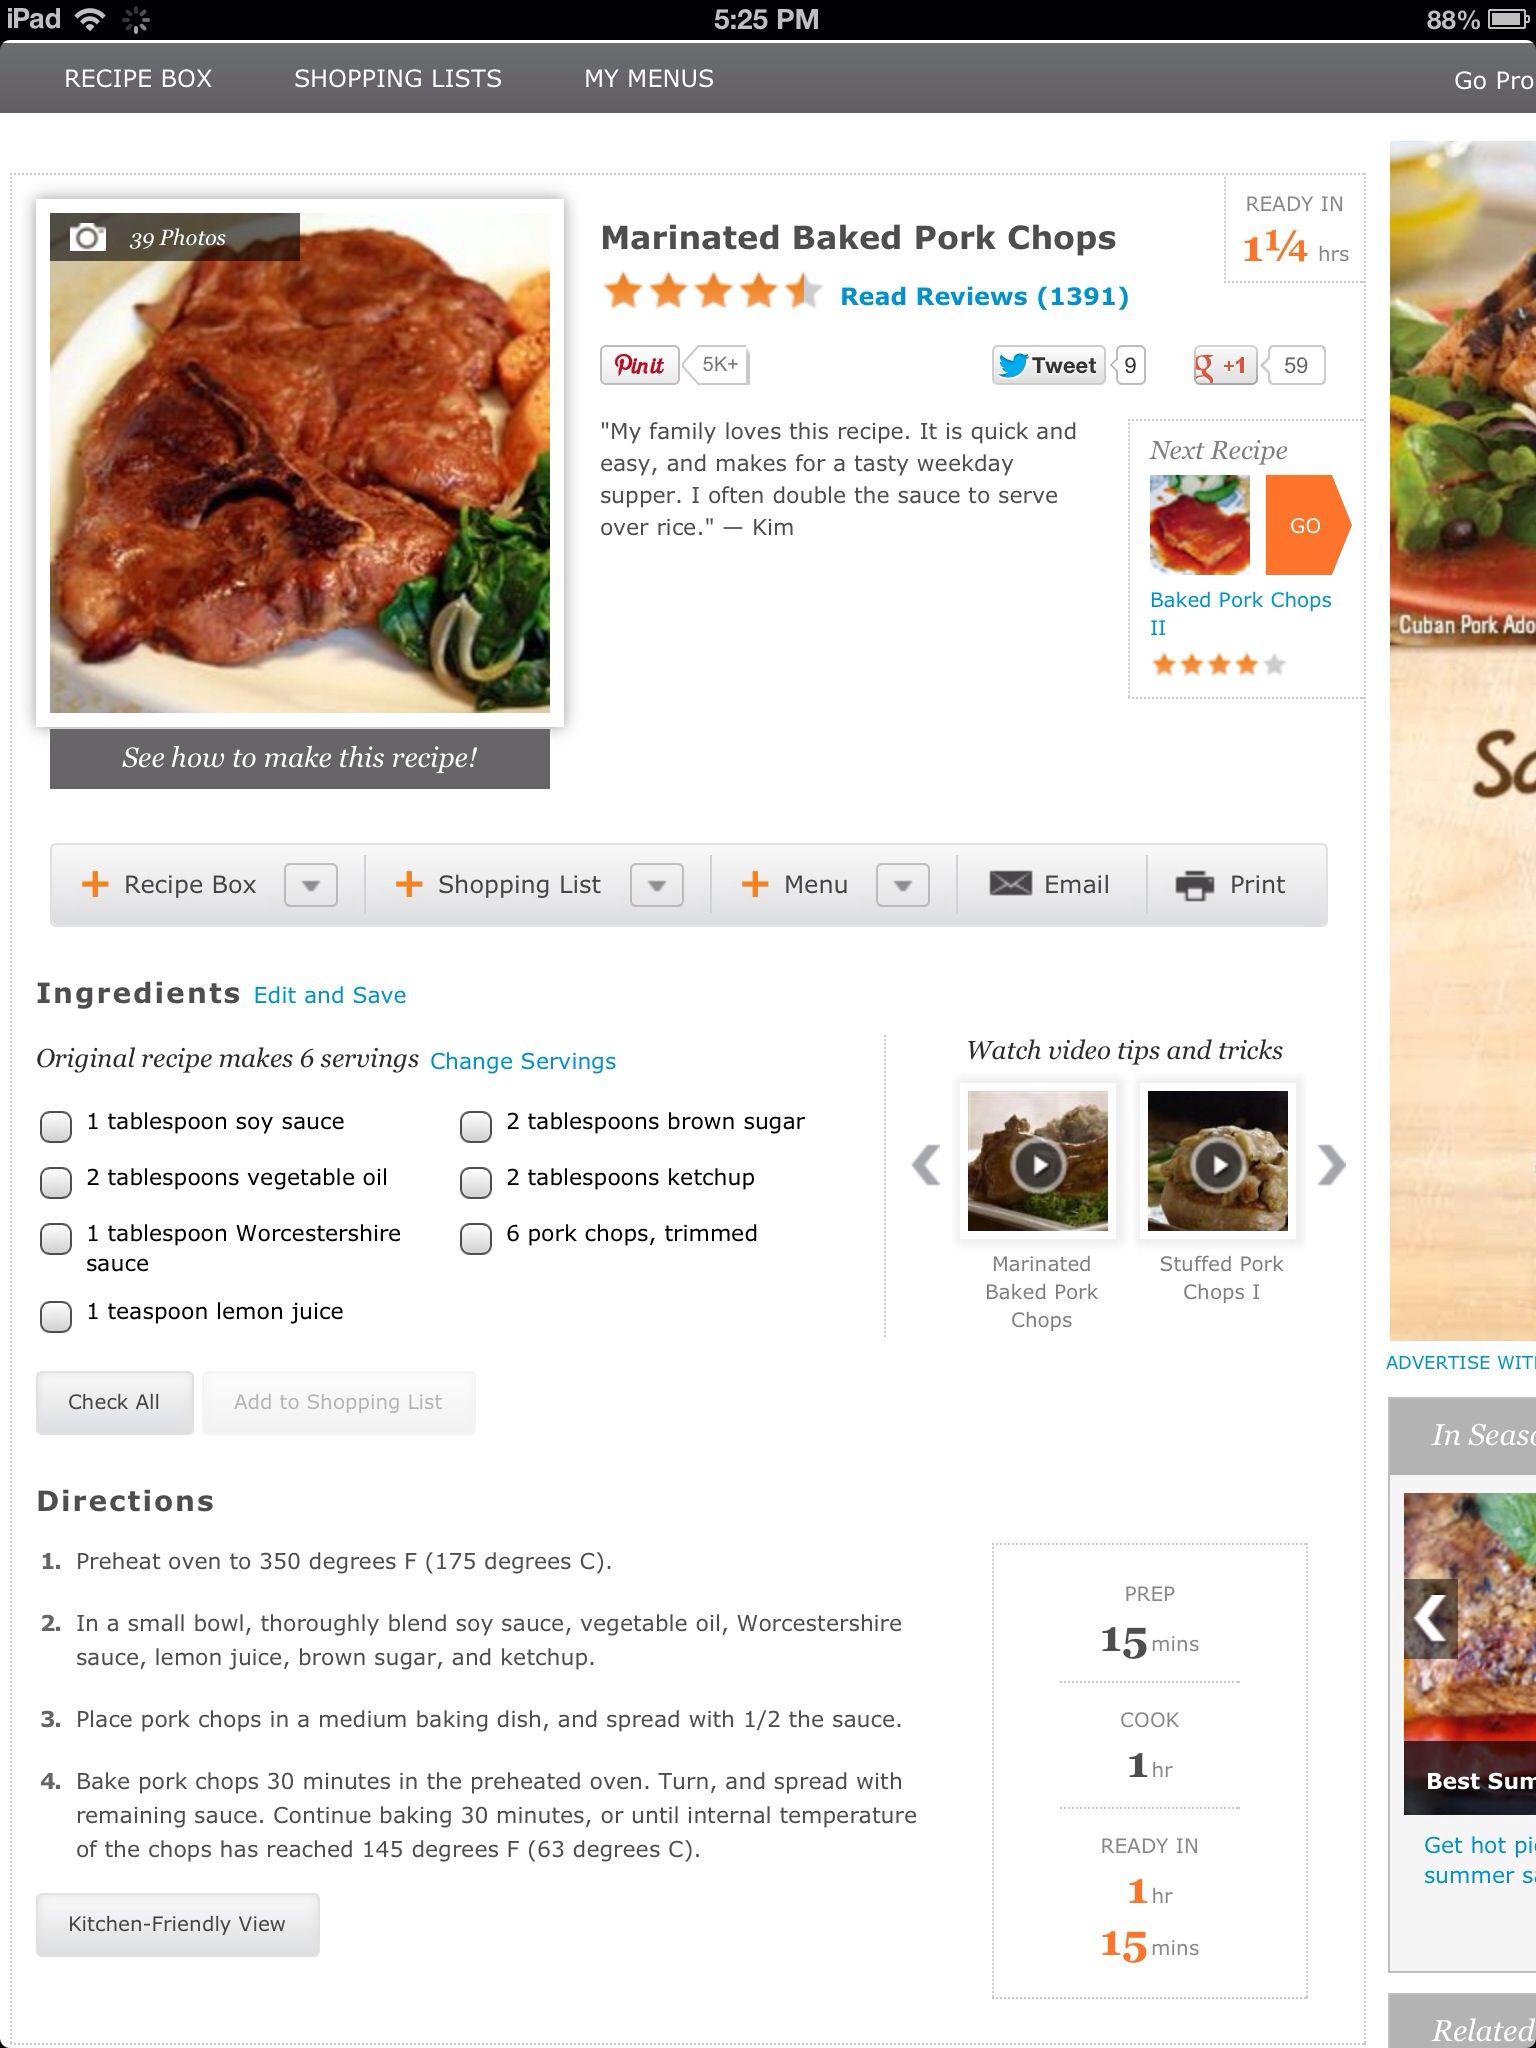 Marinated Baked Pork Chops | What's for Din Din? | Pinterest